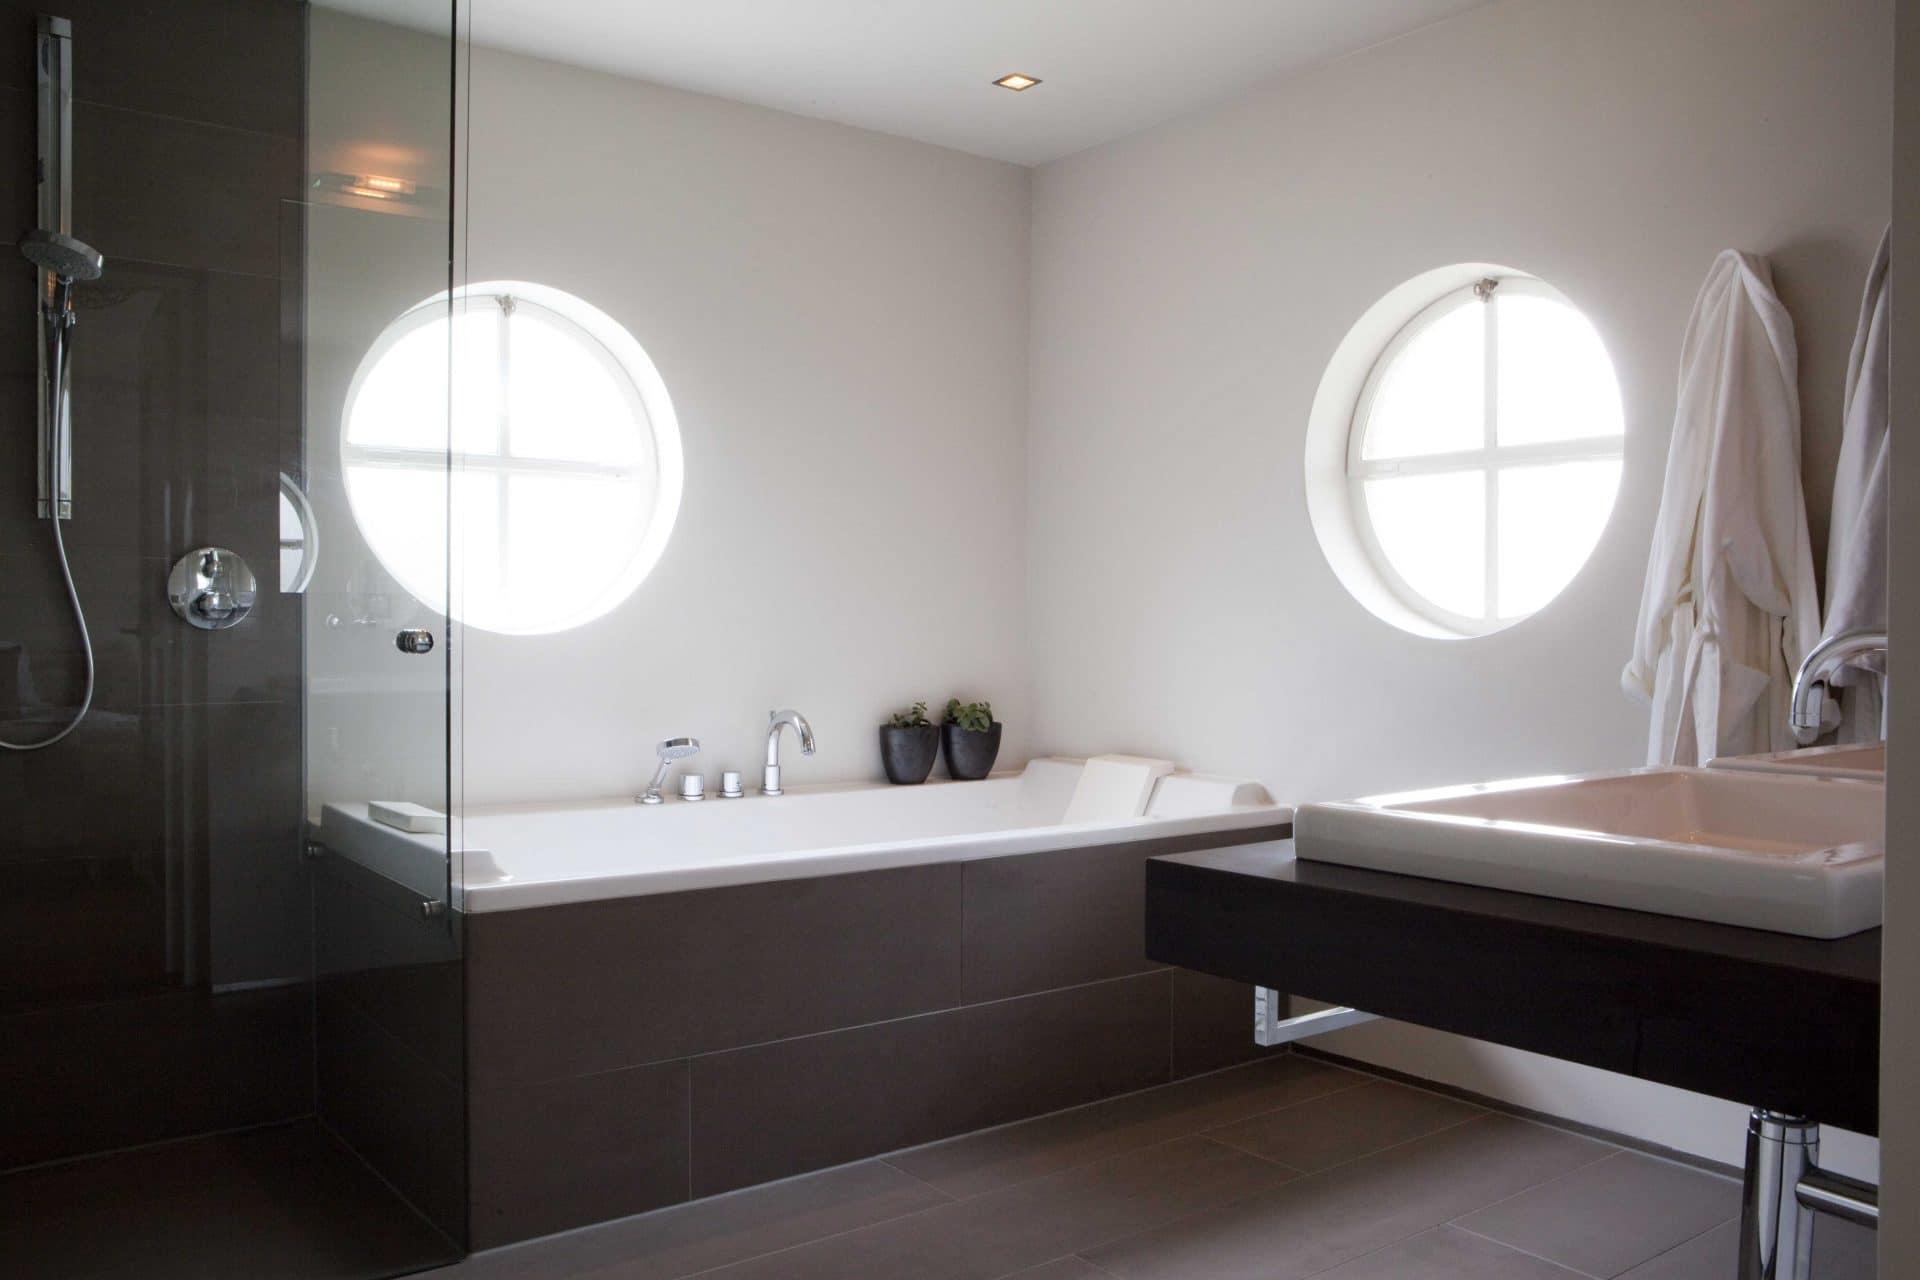 Badkamers draaien om funktionaliteit sfeer en beleving van de ruimte